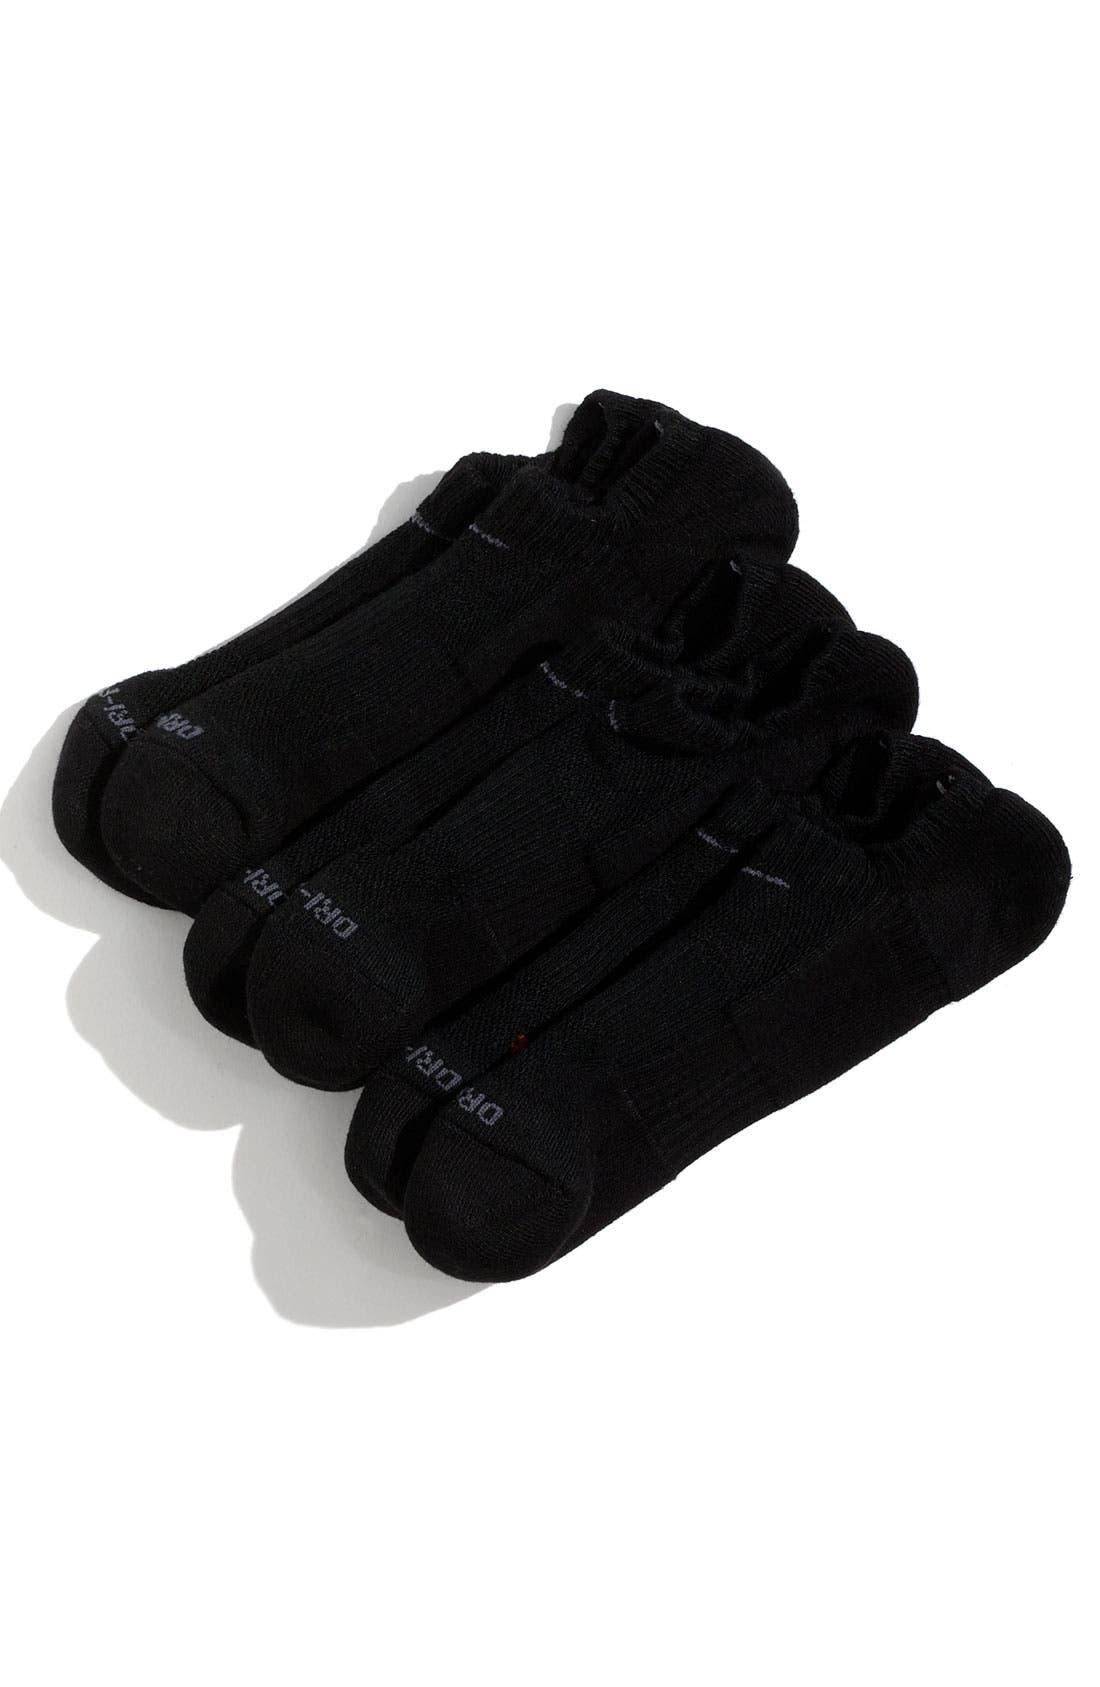 Alternate Image 1 Selected - Nike Dri-FIT No-Show Socks (3-Pack) (Little Boys & Big Boys)